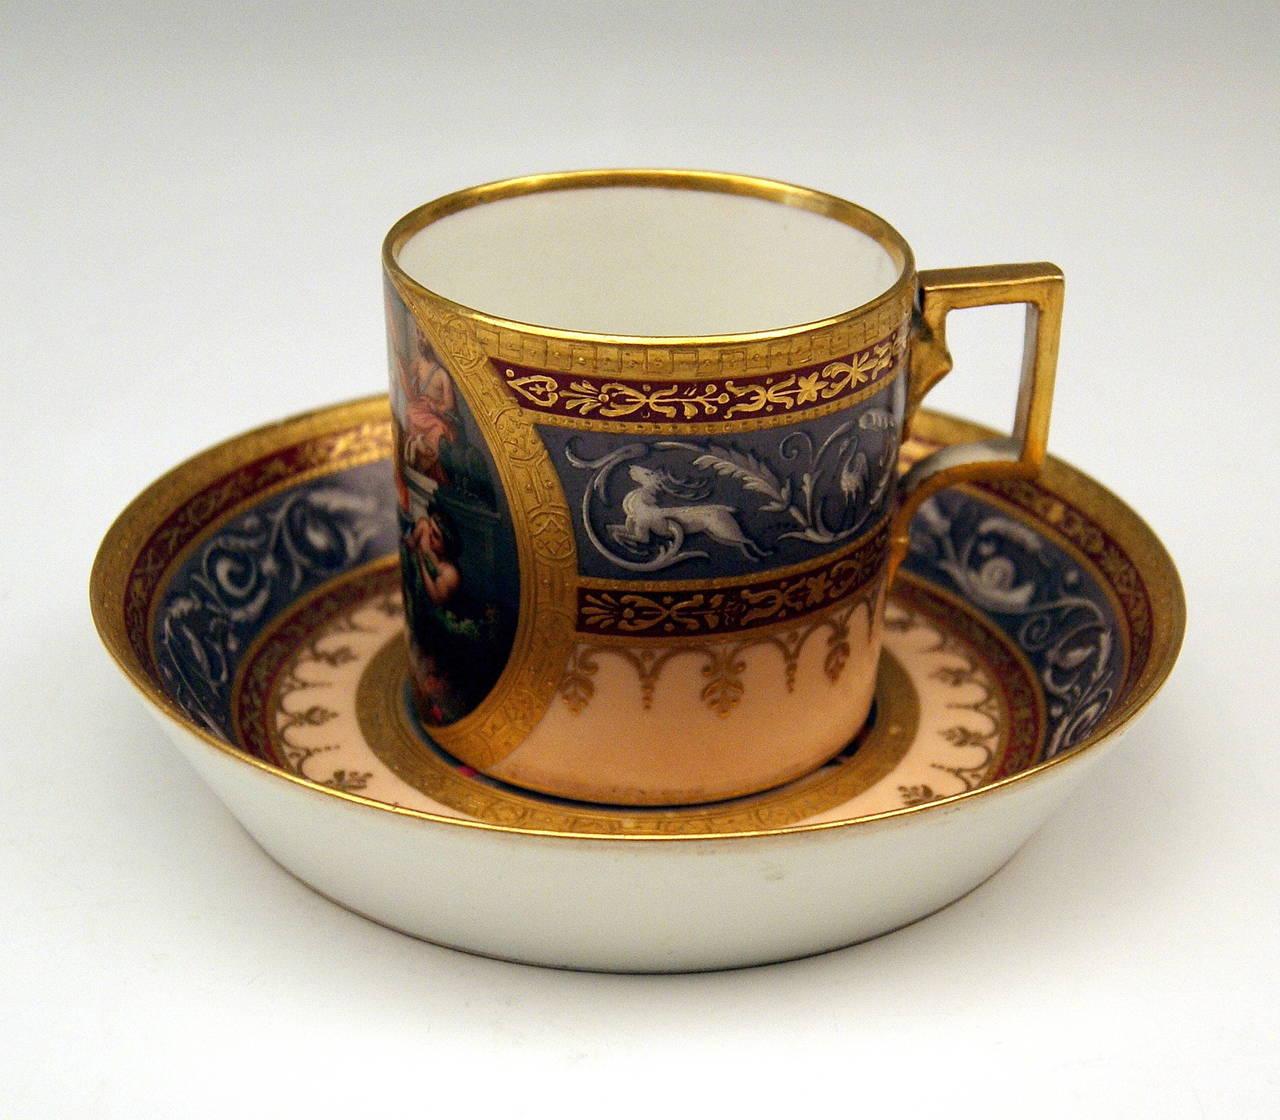 Imperial Porcelain Antique Mythology Cup And Saucer